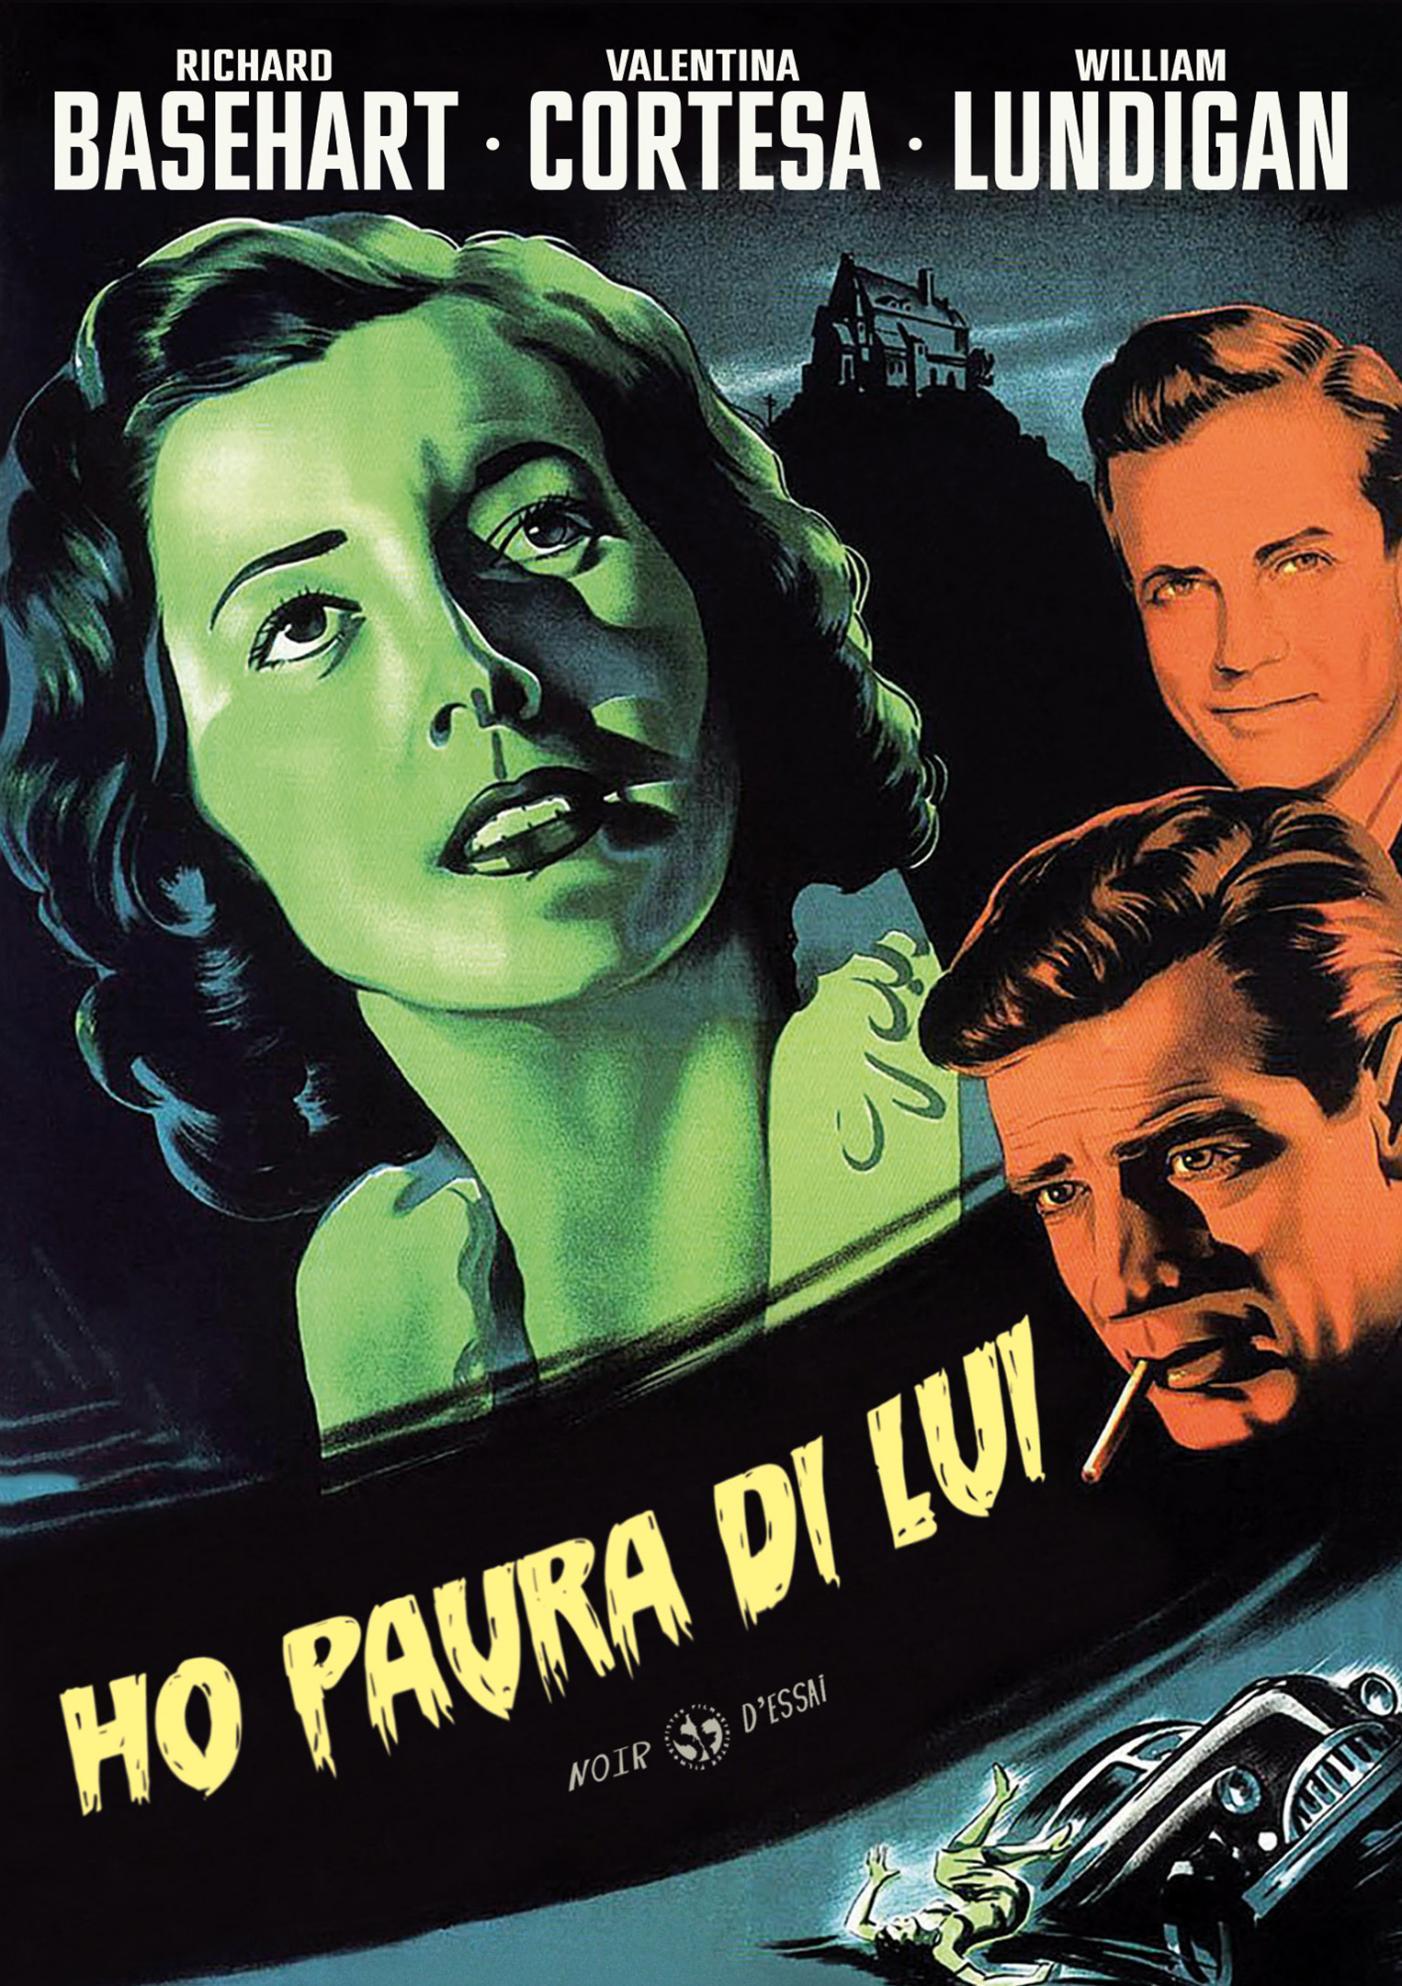 HO PAURA DI LUI (DVD)